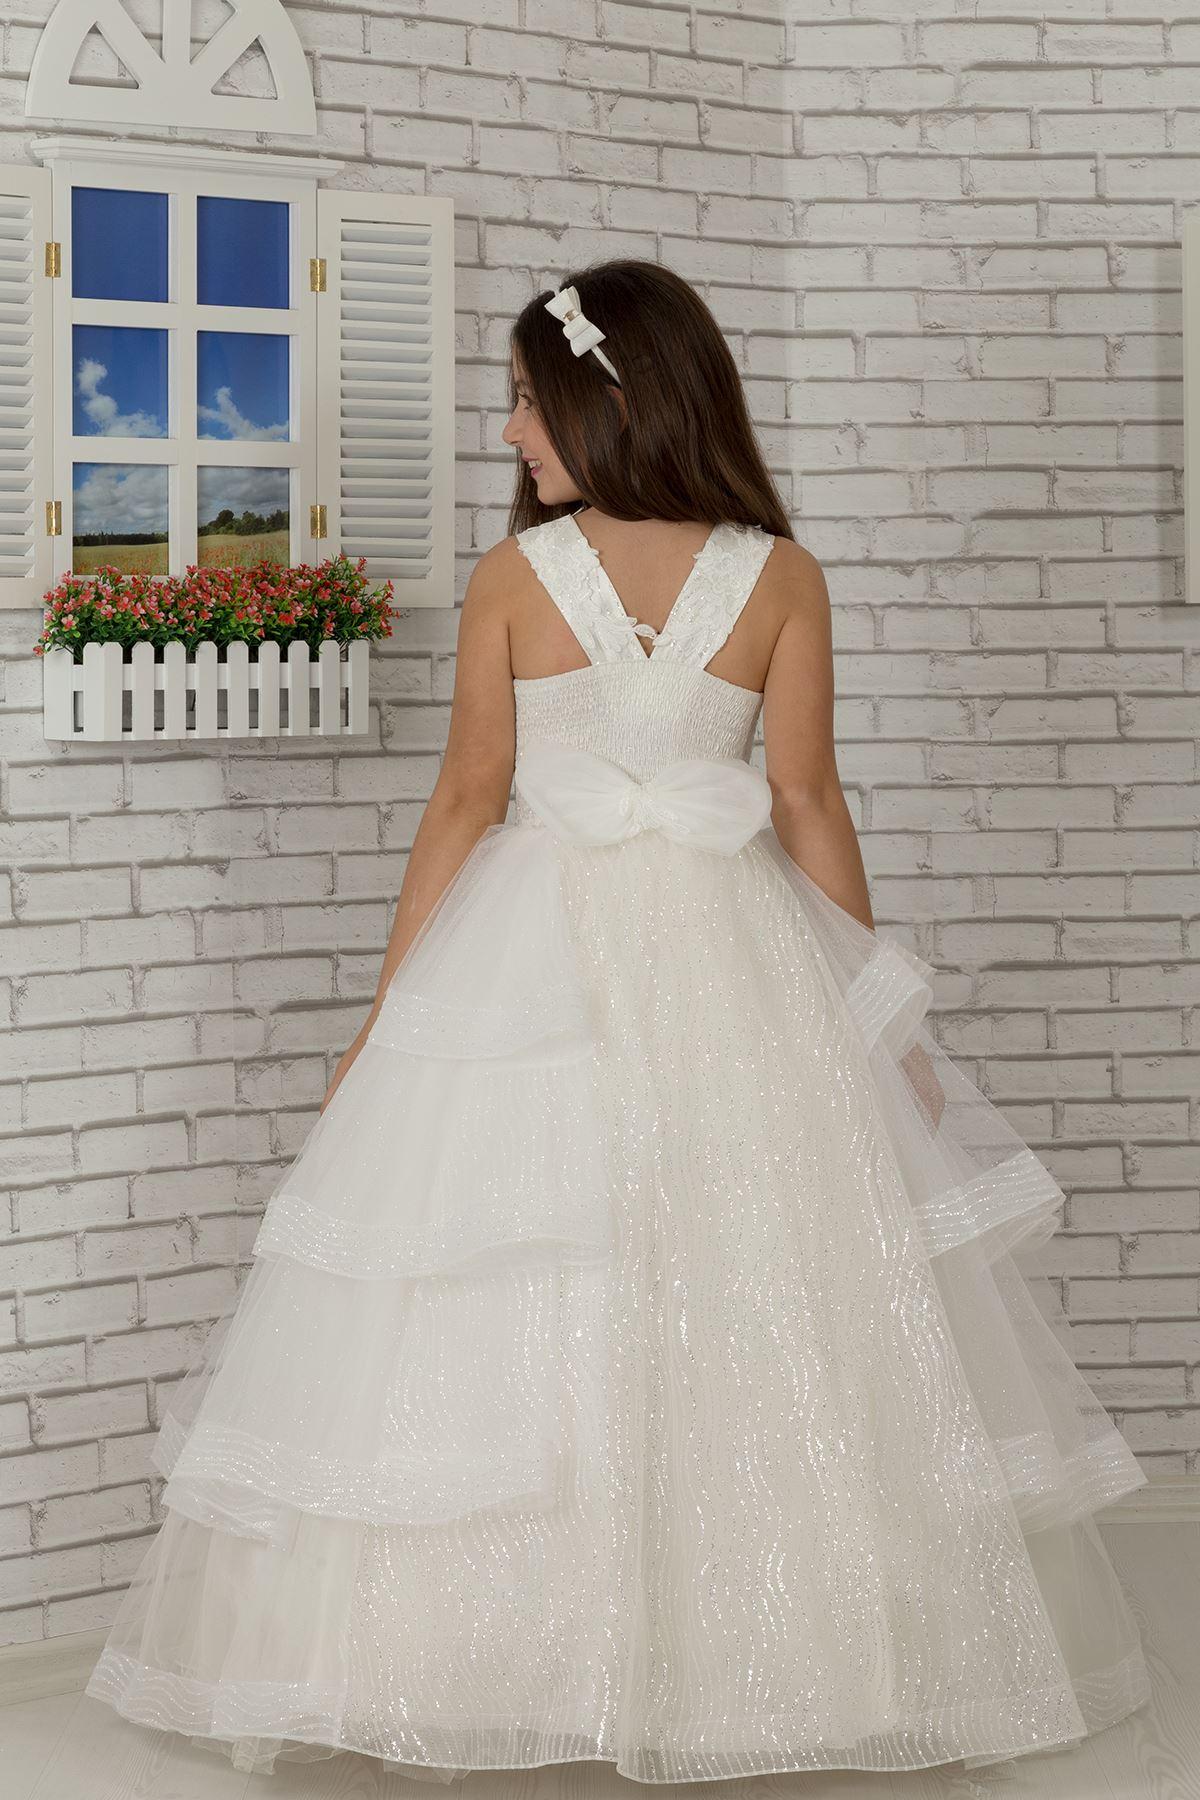 Körper bestickt, Mantel Rock detailliert, spezielle silbrig Tüll flauschige Mädchen Kinder Abendkleid 625 Creme